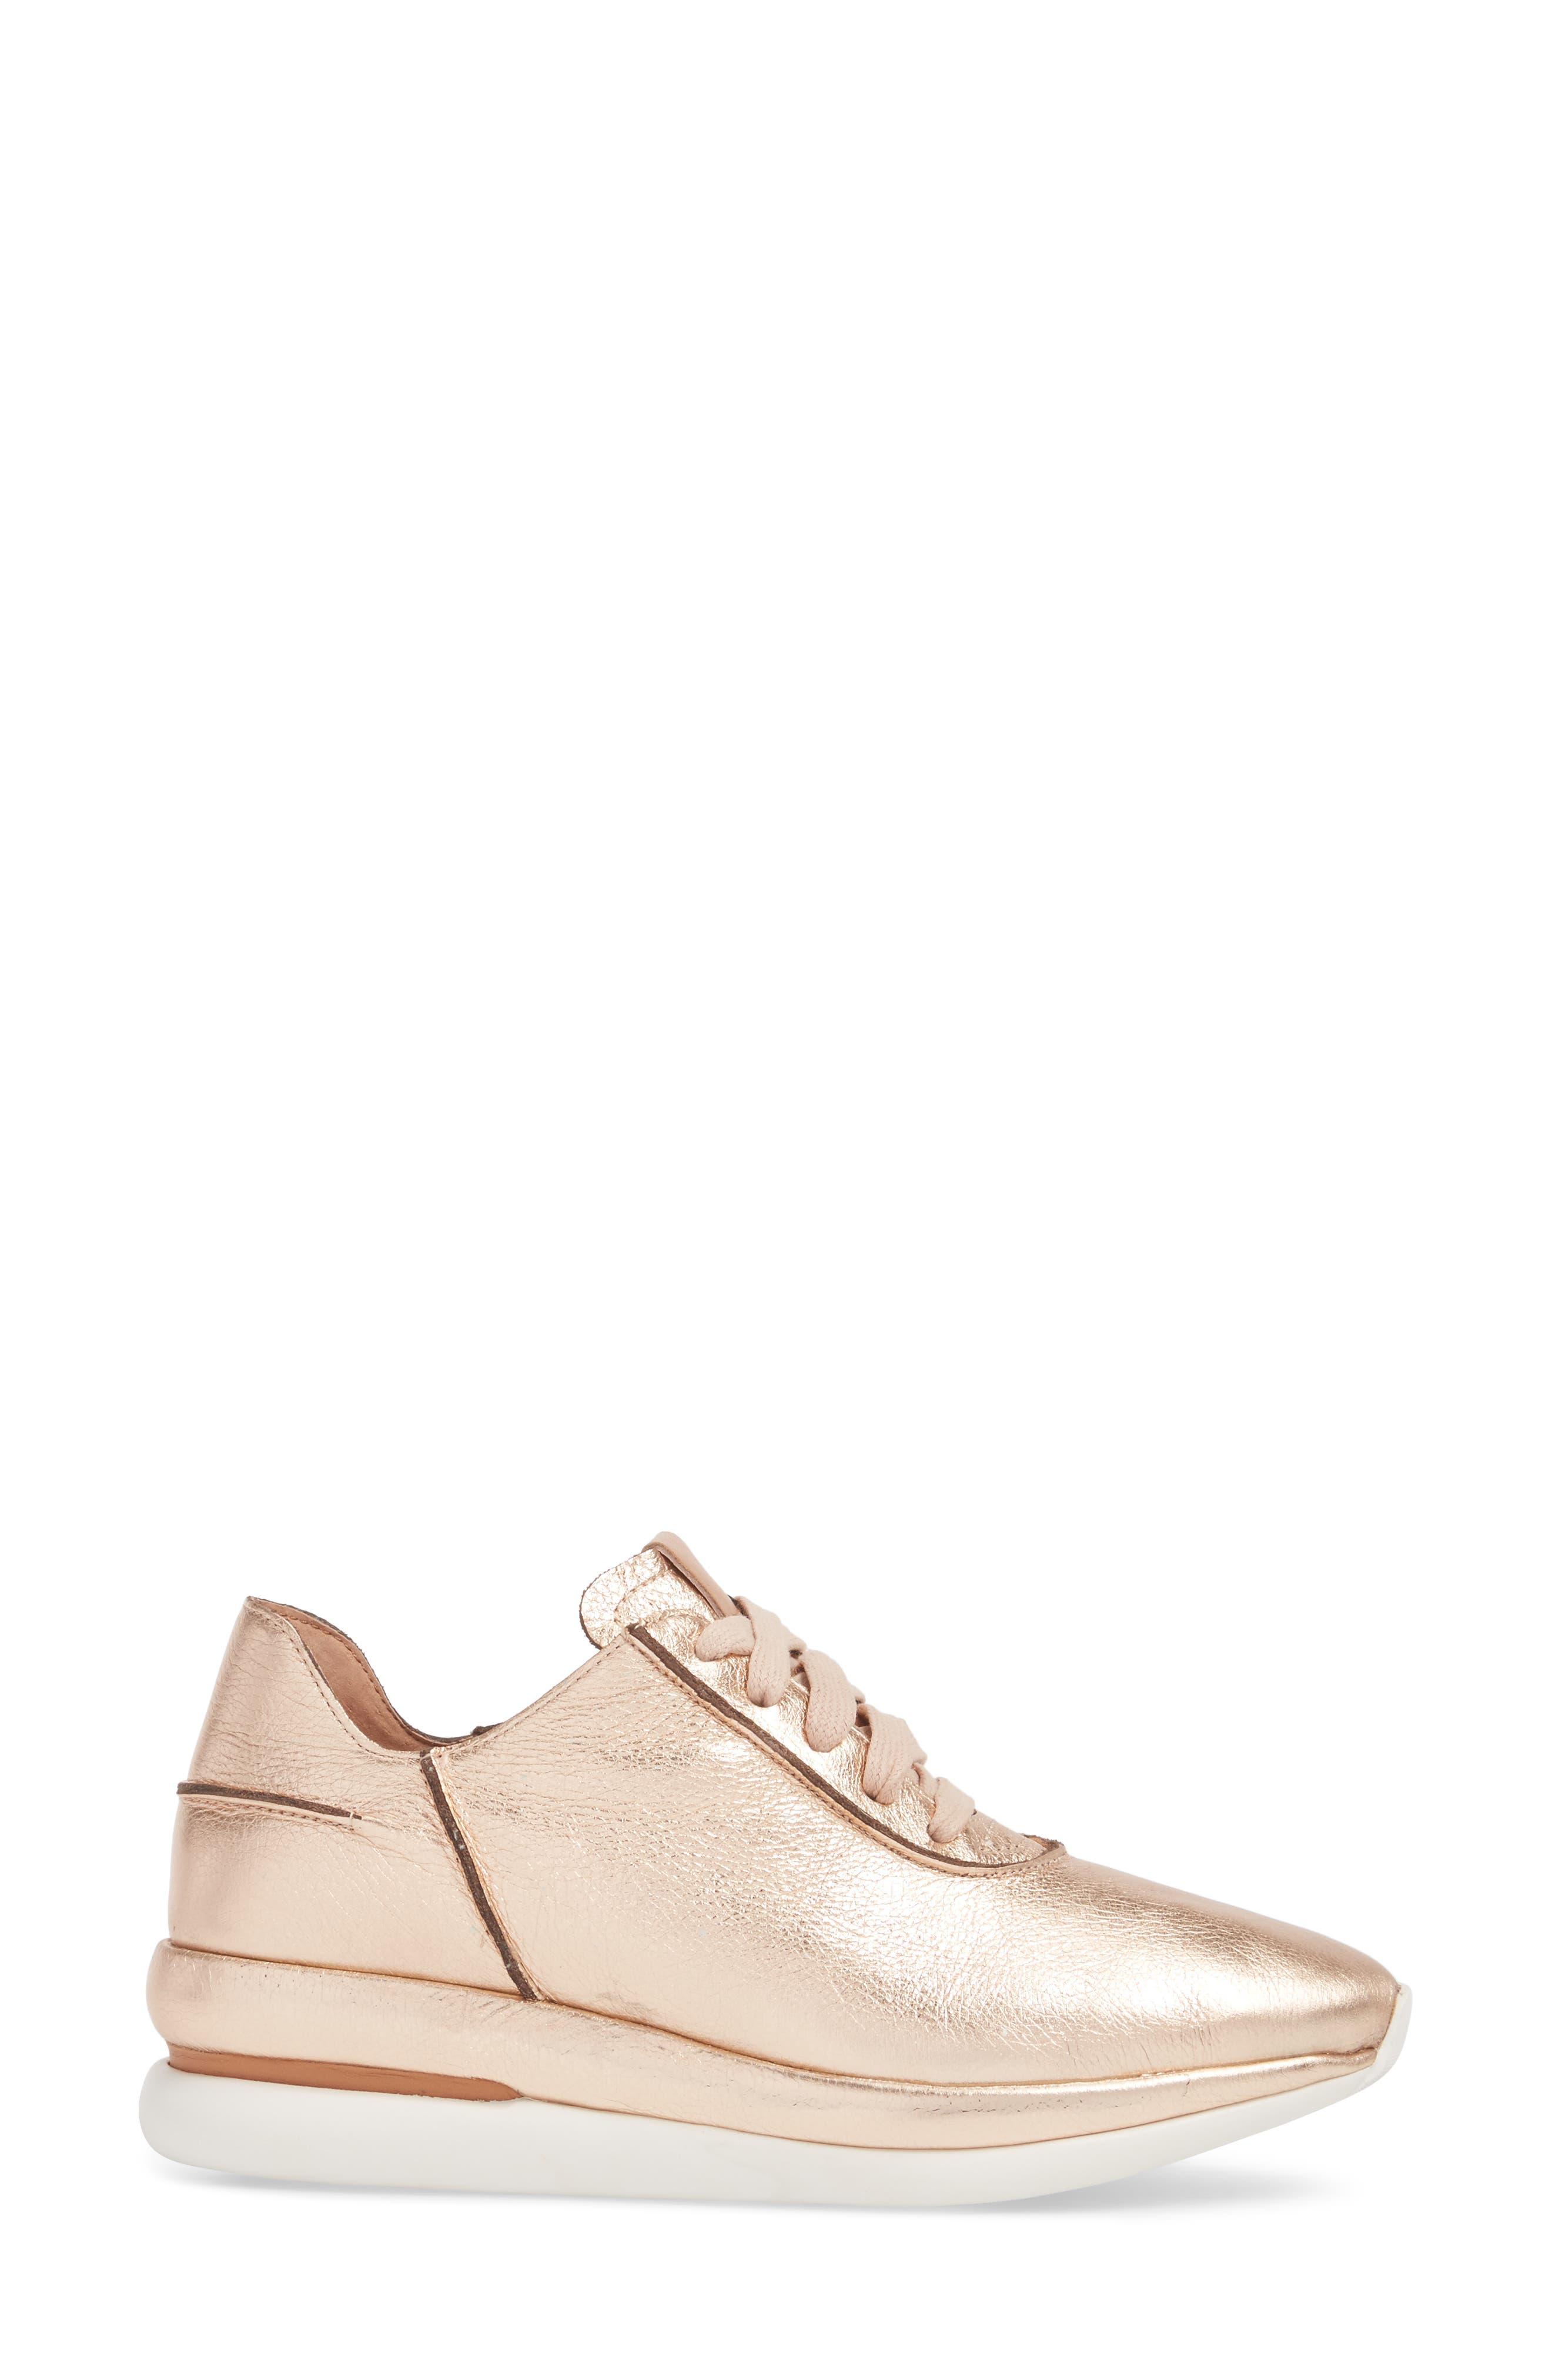 Raina Sneaker,                             Alternate thumbnail 3, color,                             ROSE GOLD METALLIC LEATHER